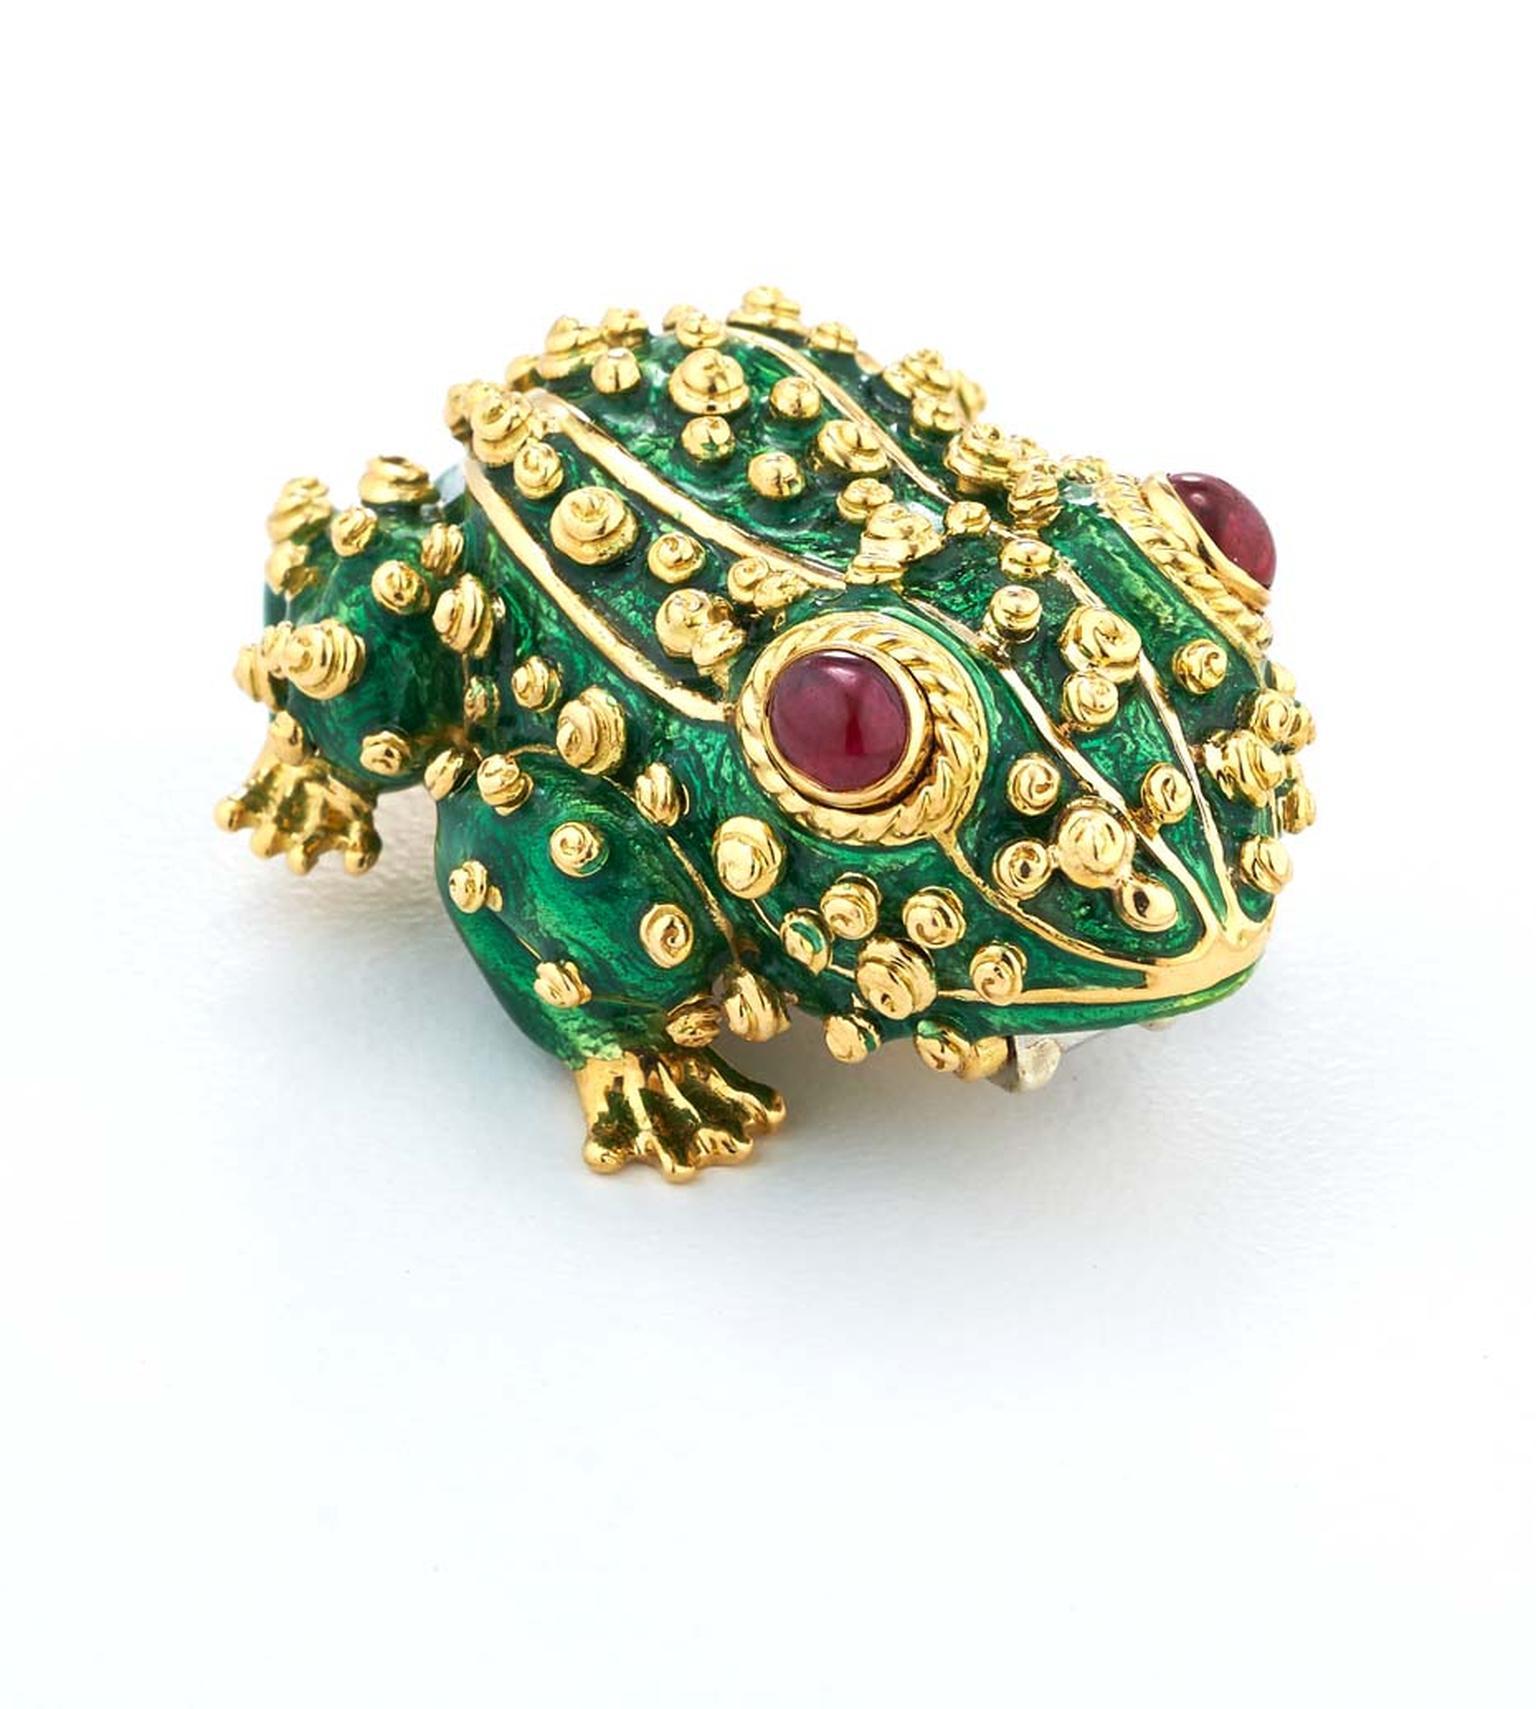 David Webb Frog  Jewellery002__1536x0_q75_crop,scale_subsampling,2_upscale,false